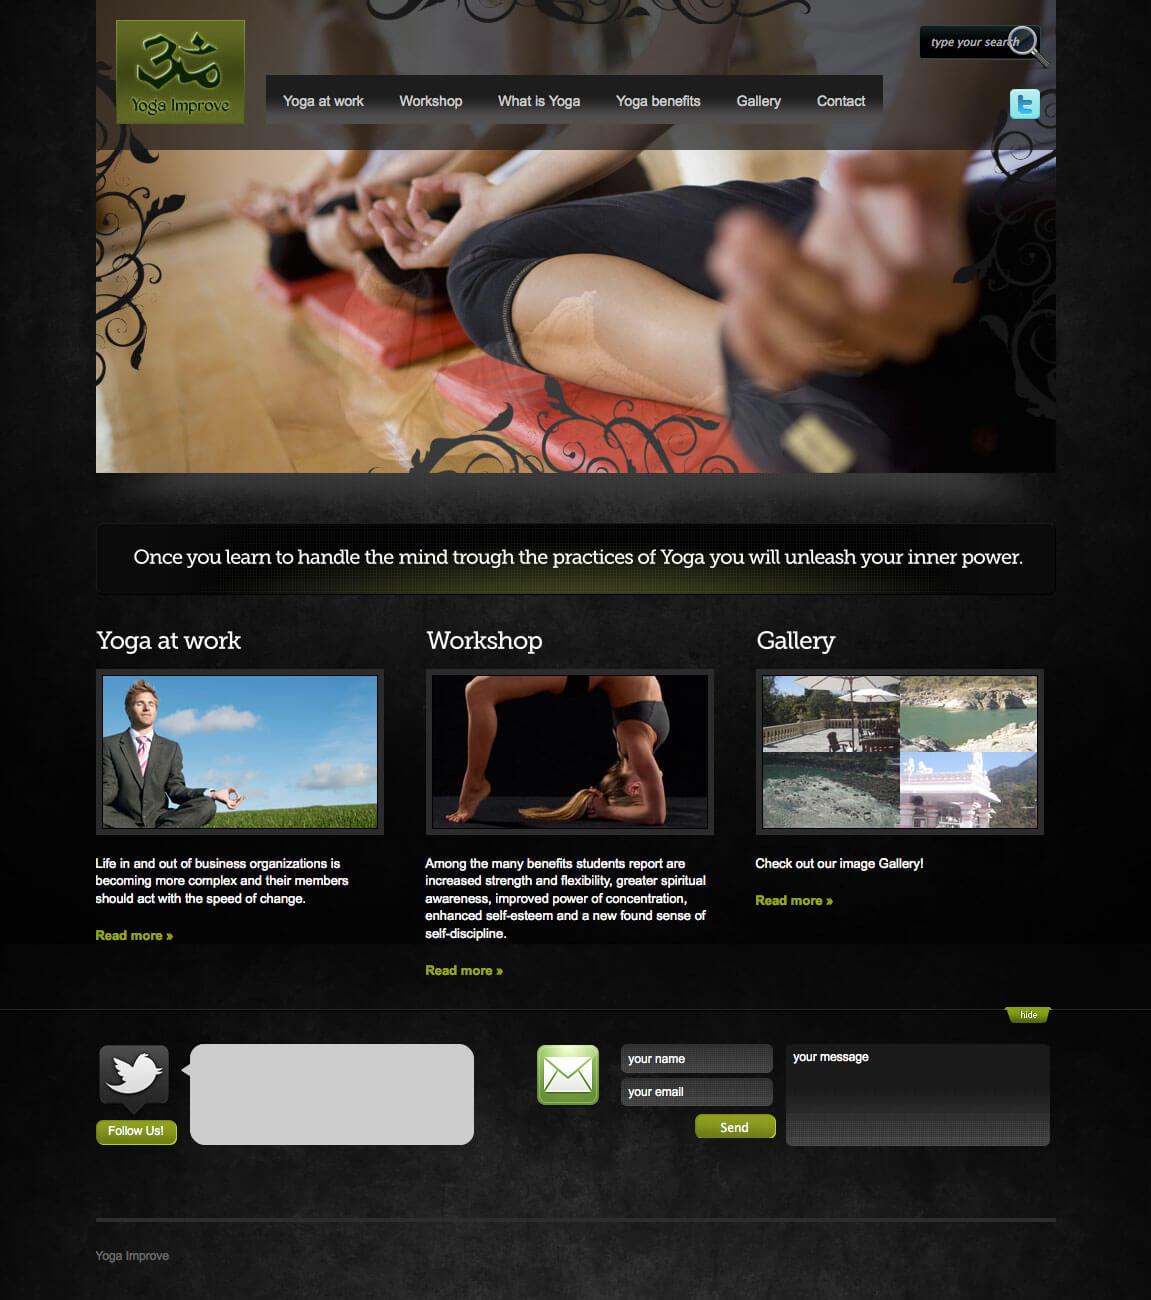 YogaImprove.com